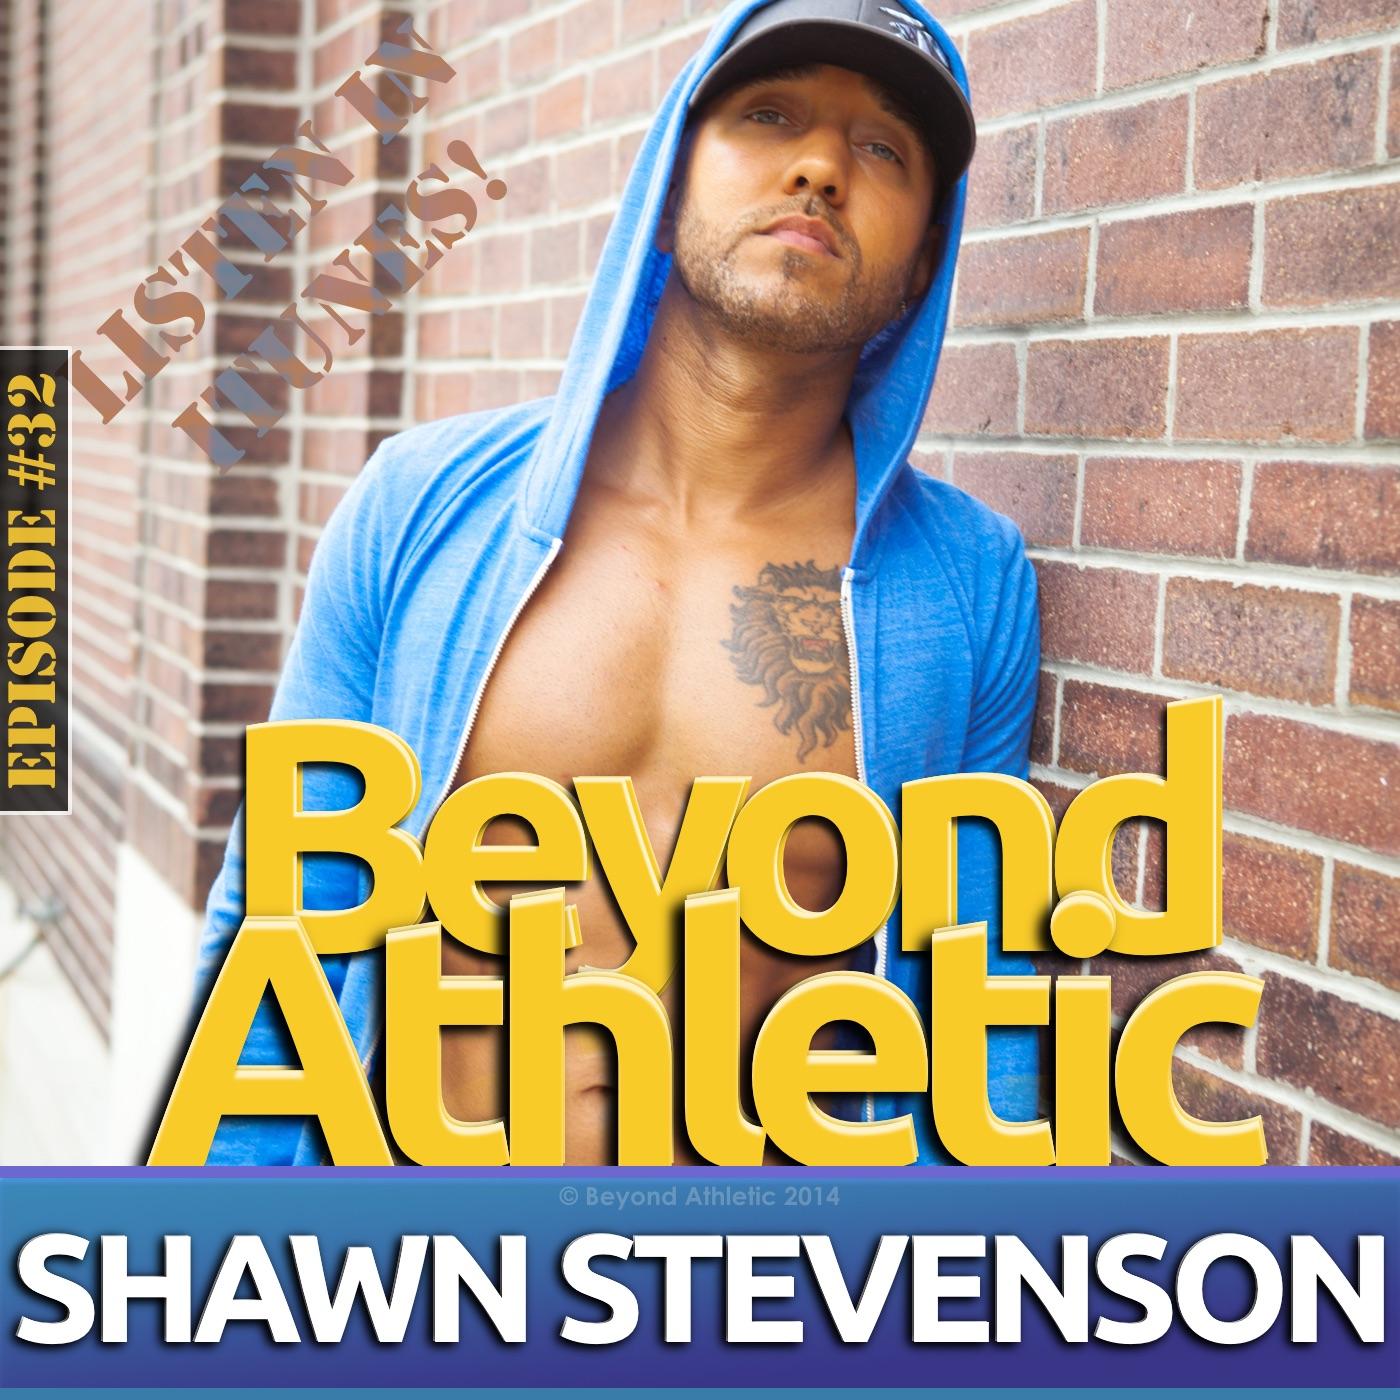 Shawn Stevenson The Model Health Show | BeyondAthletic.com